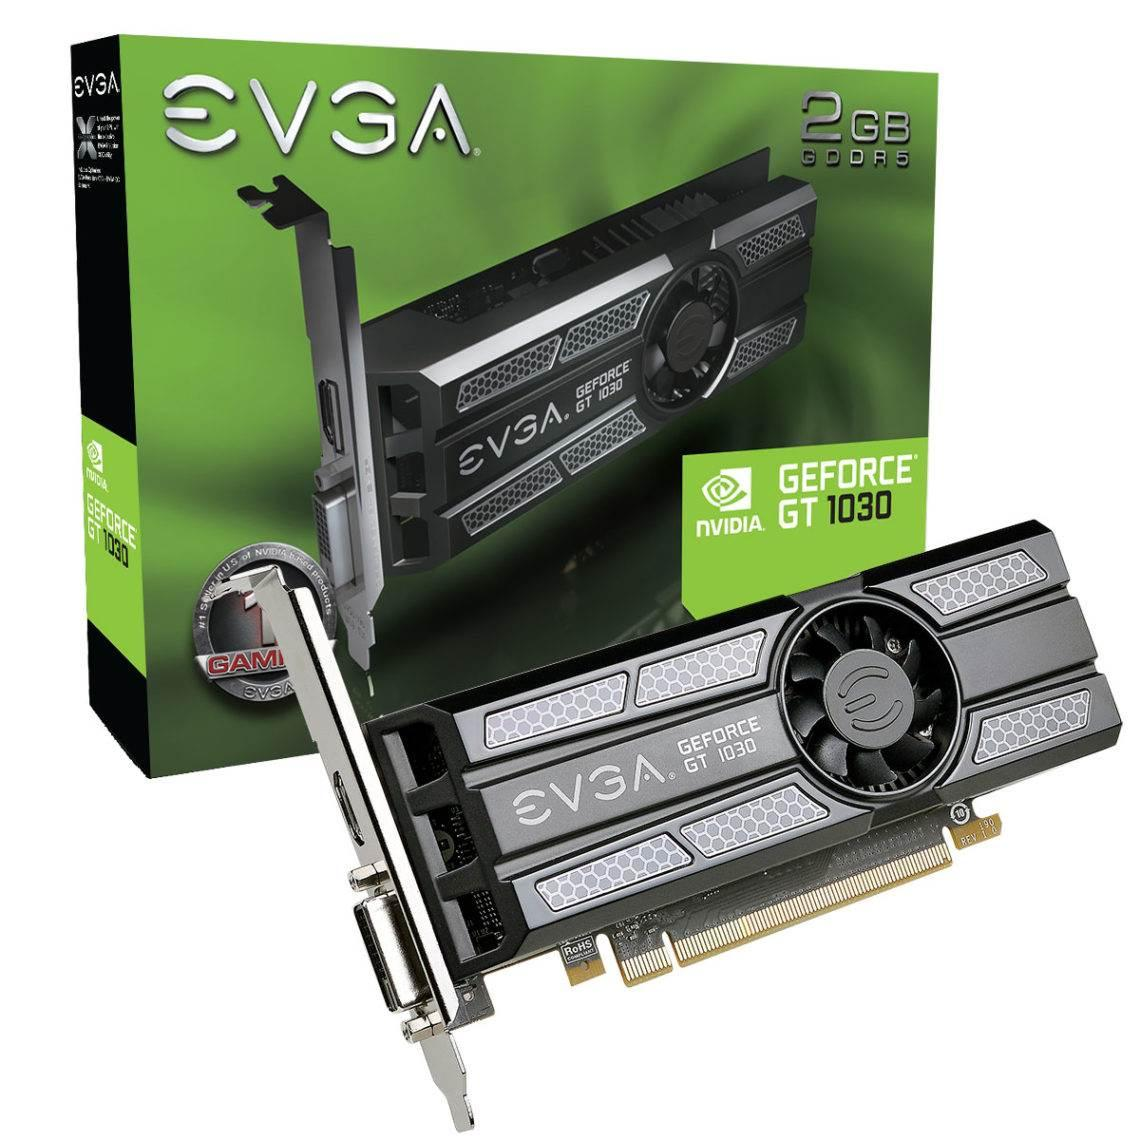 Nvidia GeForce GT 1030 resmileşti